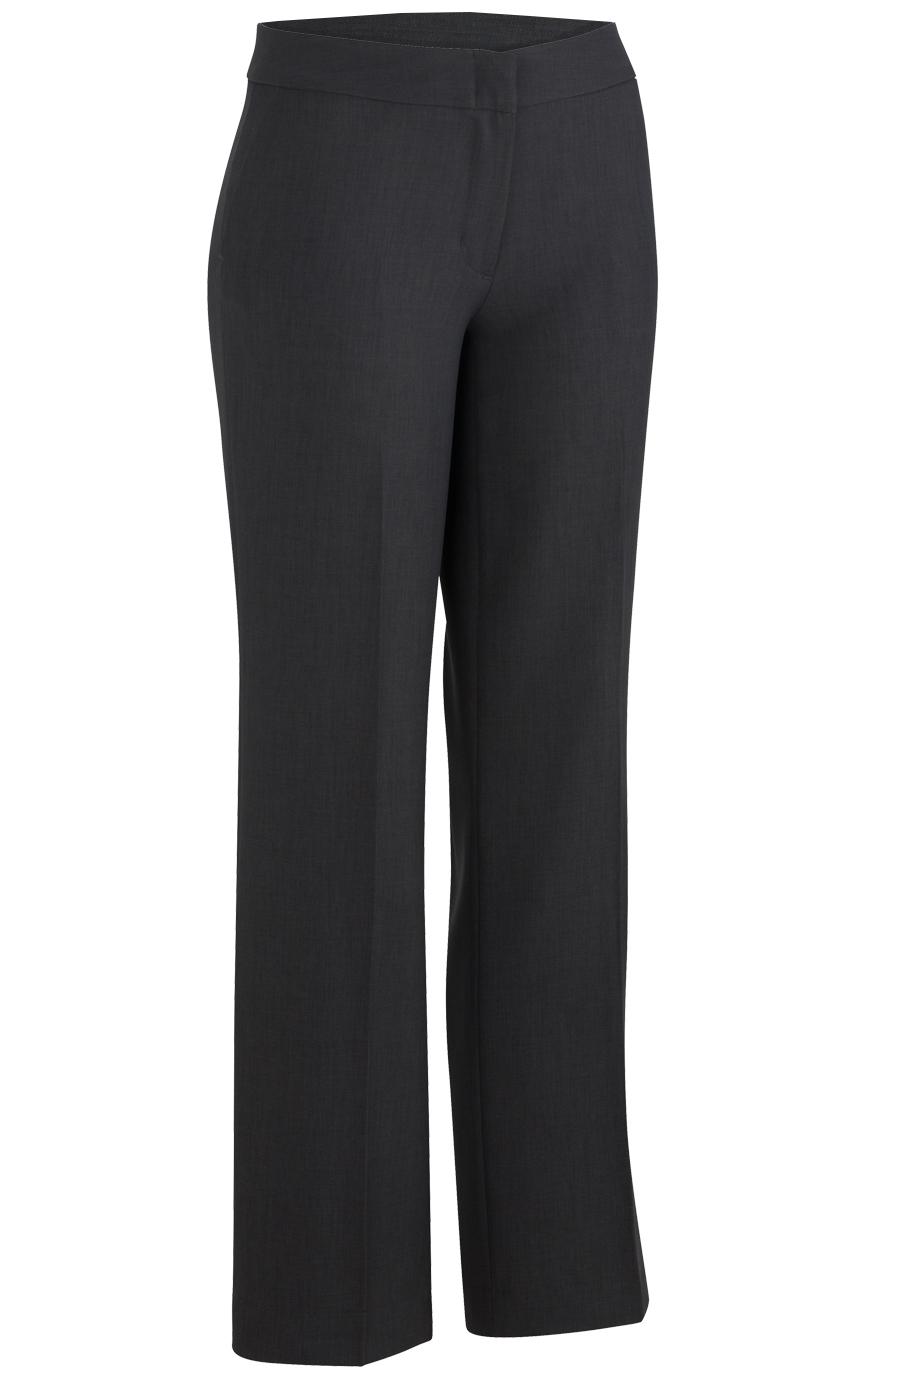 Ladies' Synergy Washable Flat Front Pant 8525